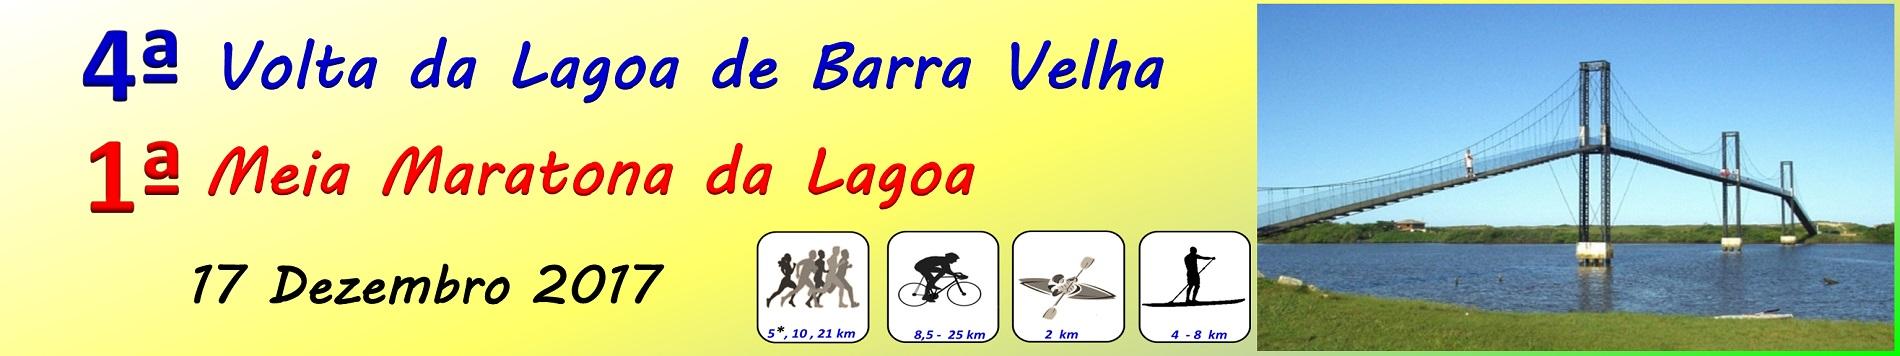 4ª VOLTA DA LAGOA DE BARRA VELHA - Imagem de topo